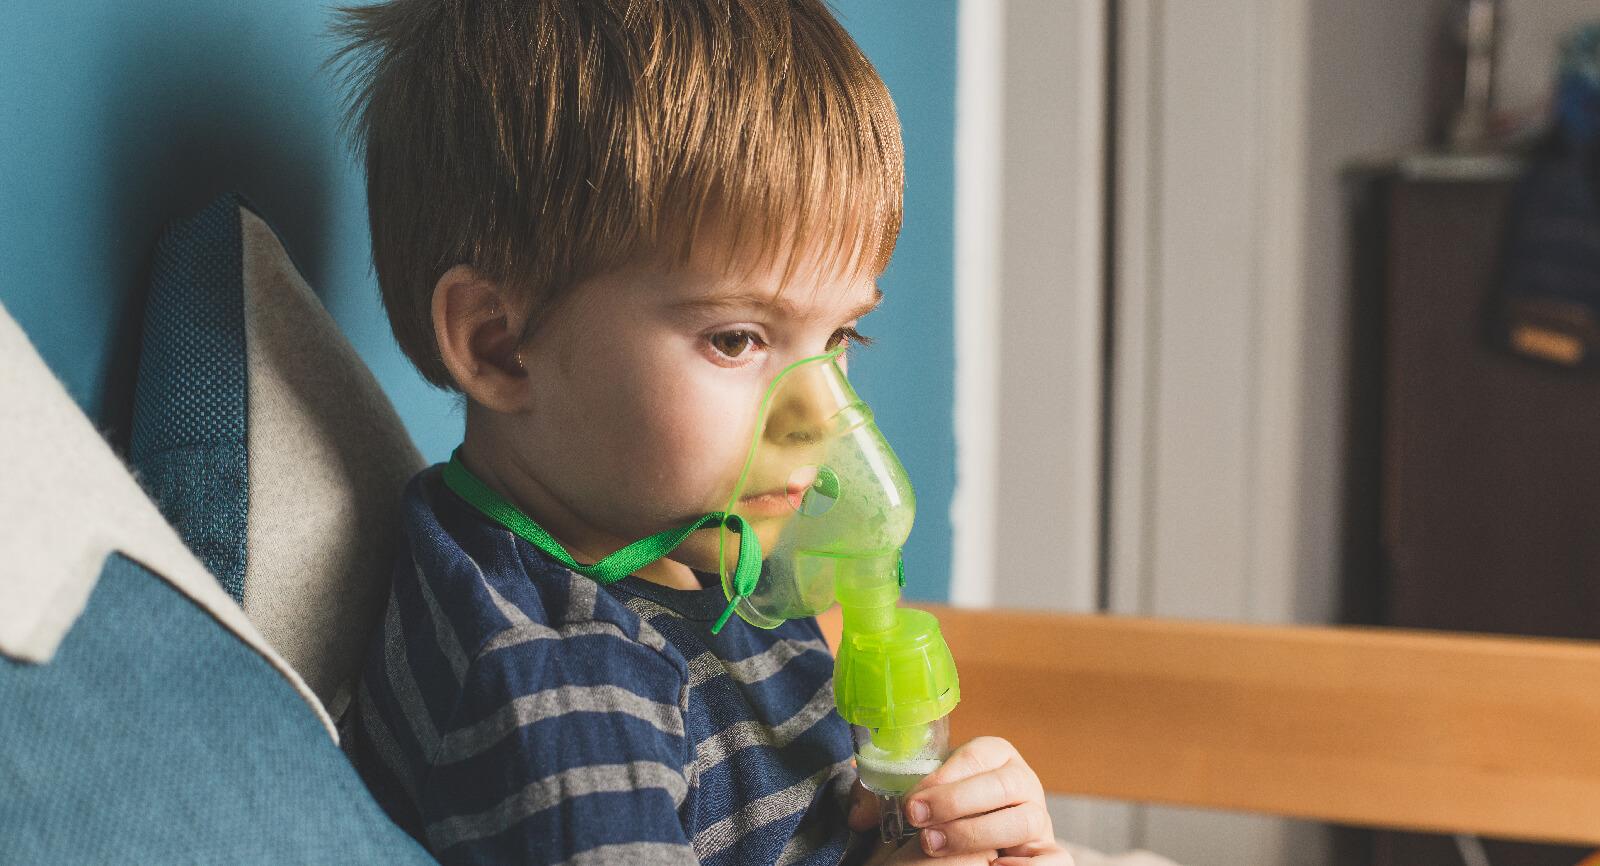 Boy with nebulizer for hypertonic saline